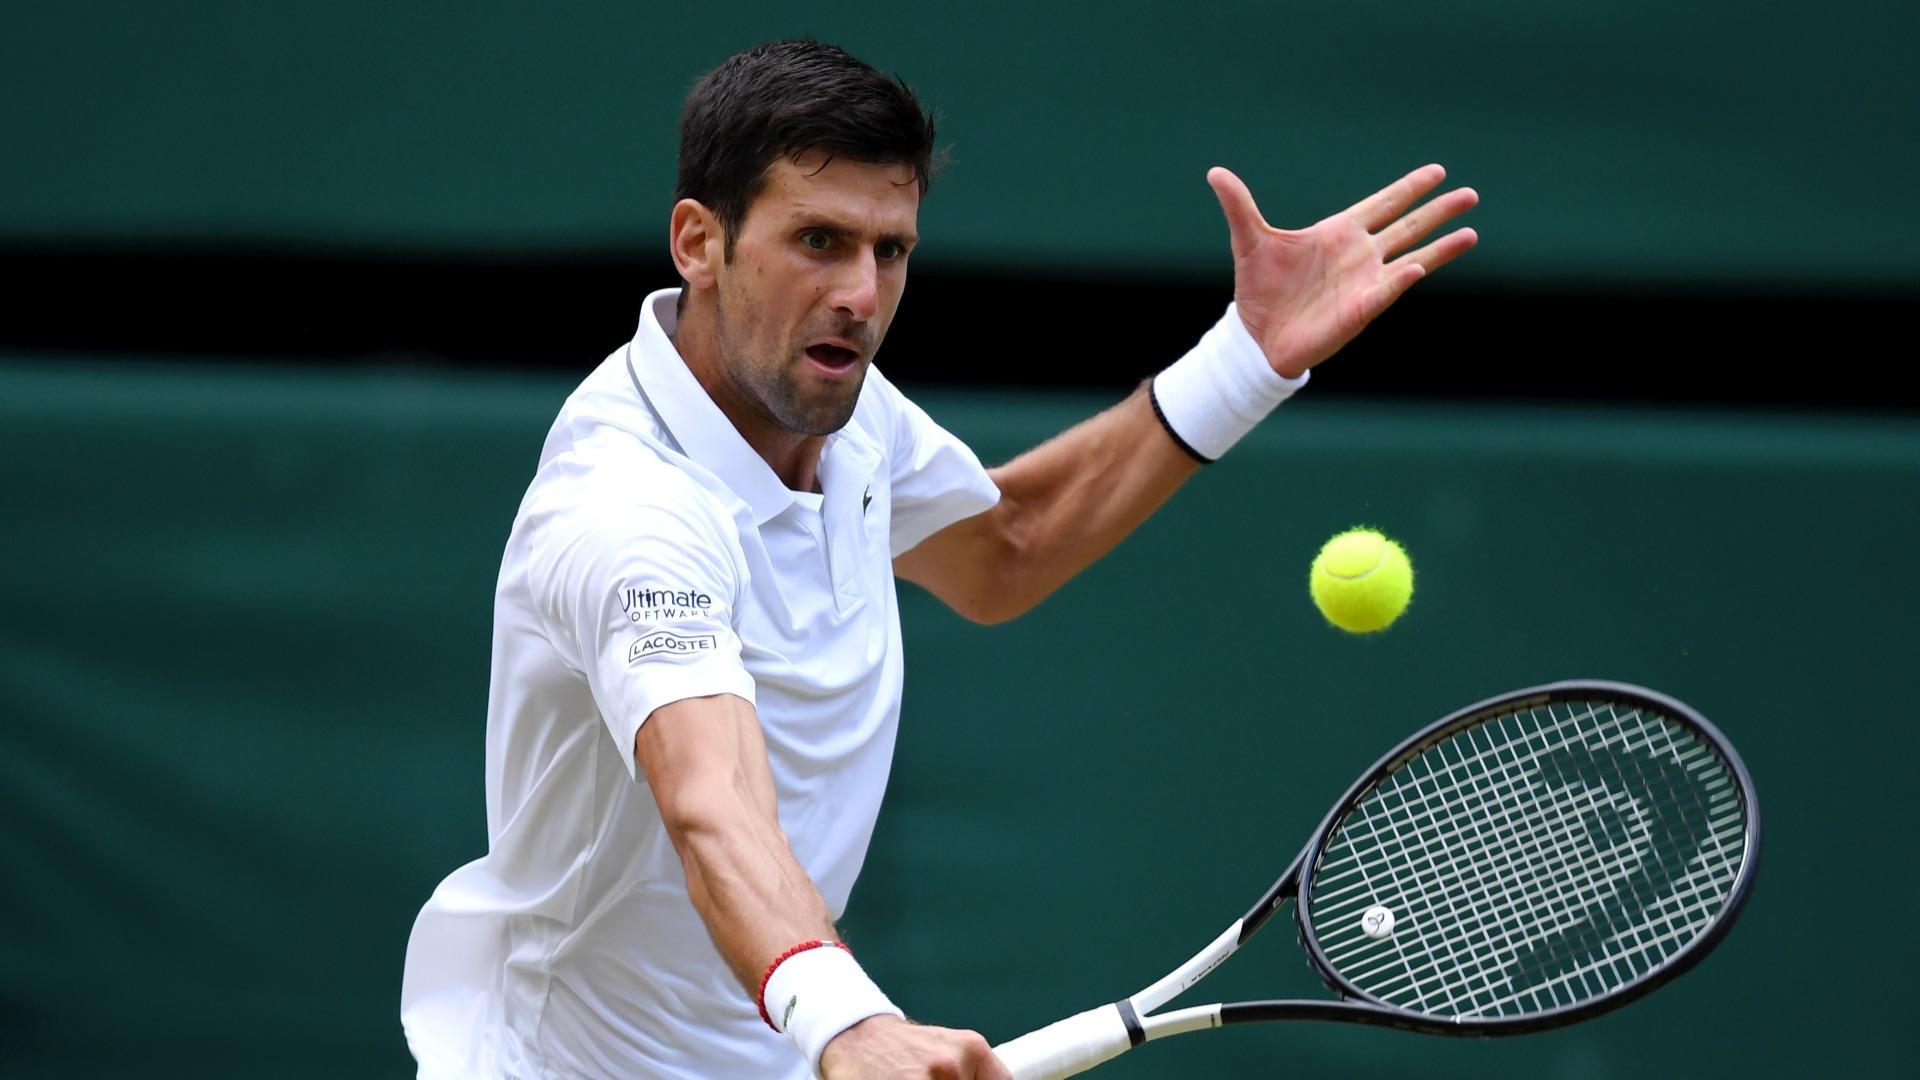 Novak Djokovic withdraws from Rogers Cup